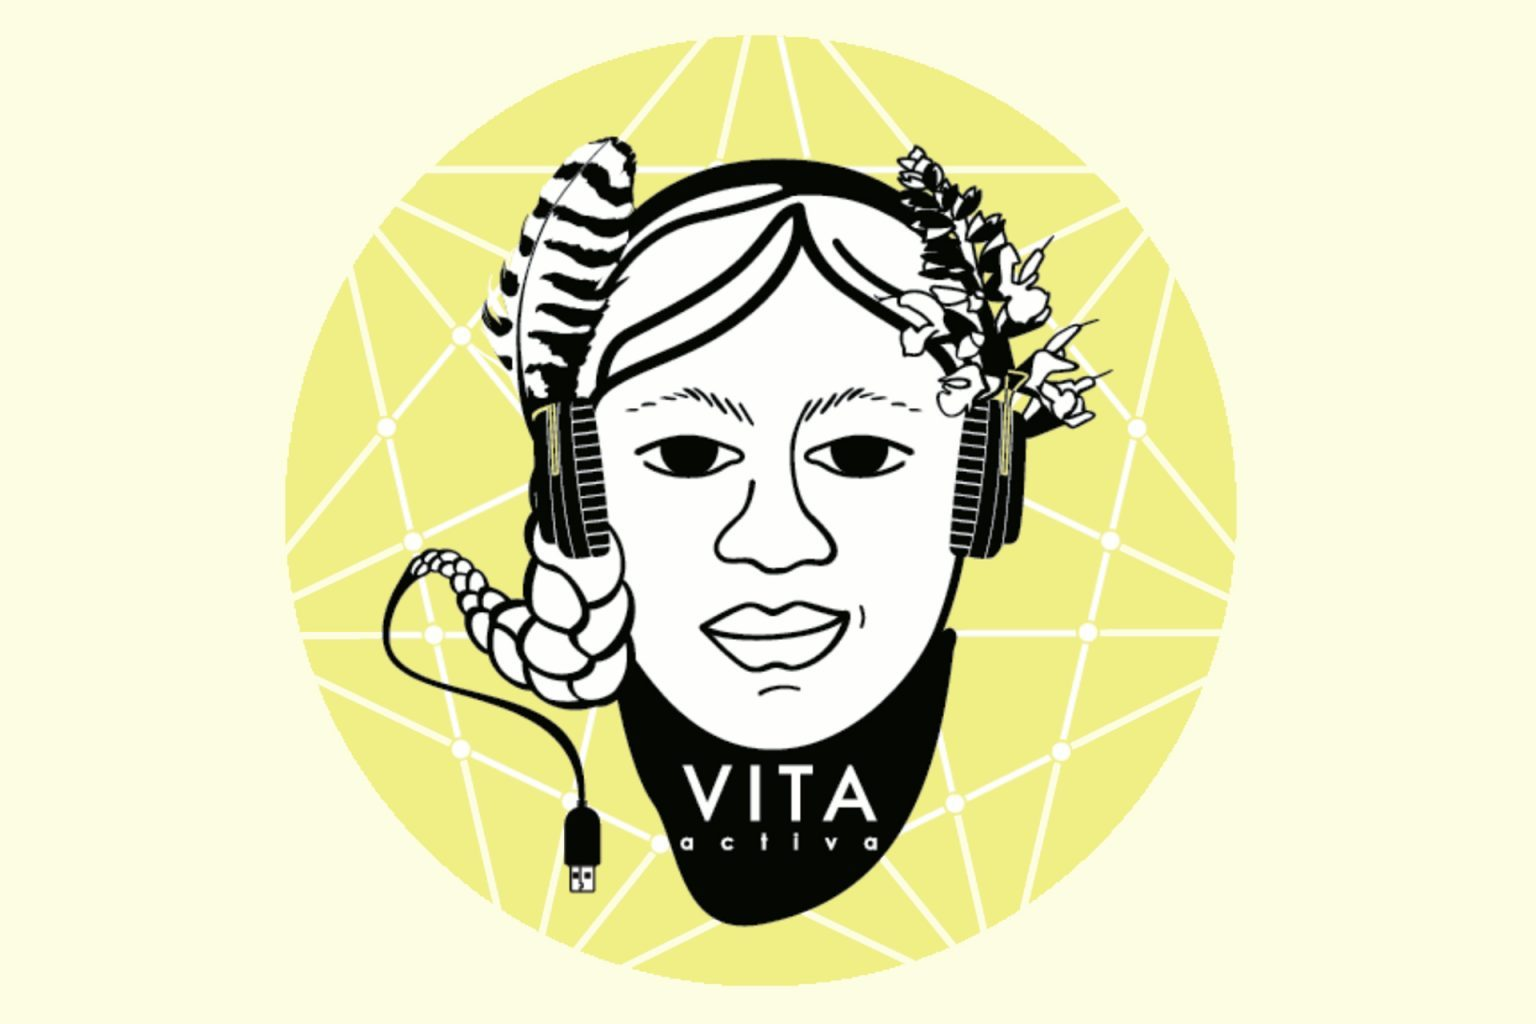 Líneas de ayuda asisten a mujeres periodistas de América Latina que sufren ataques en línea